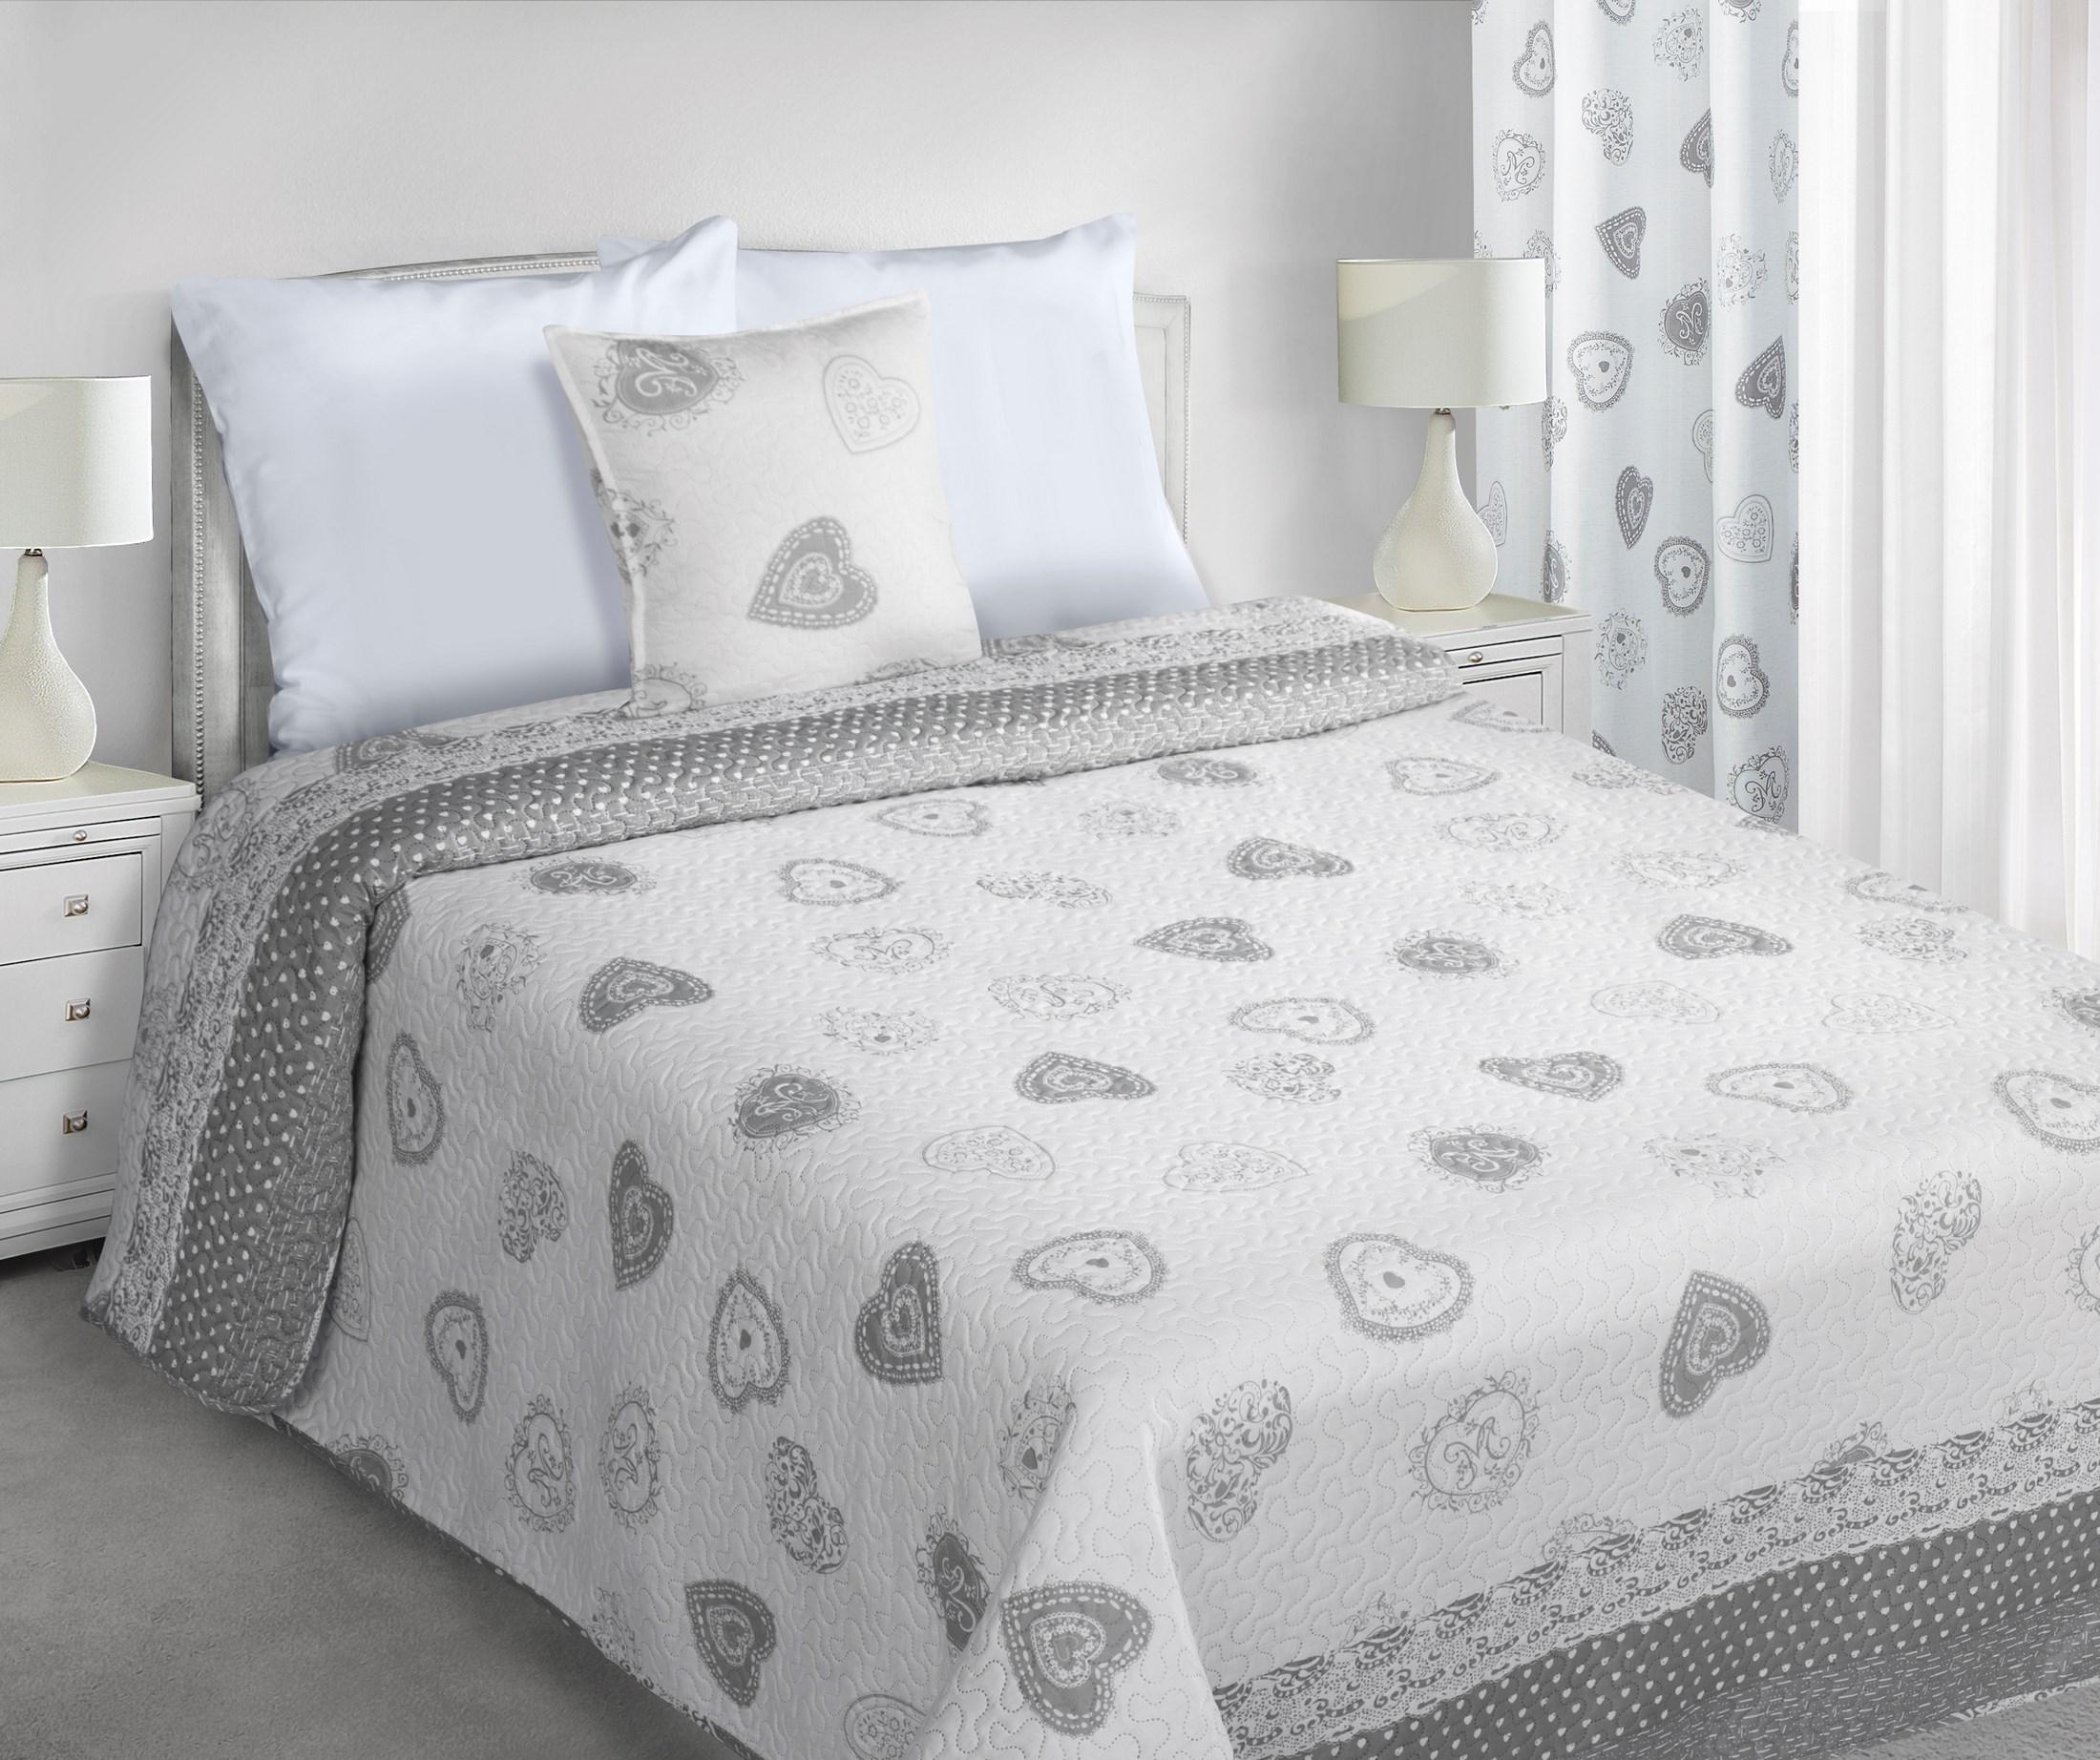 Luxus ágytakaró IZZY 220x240 cm 54ee2cb29c